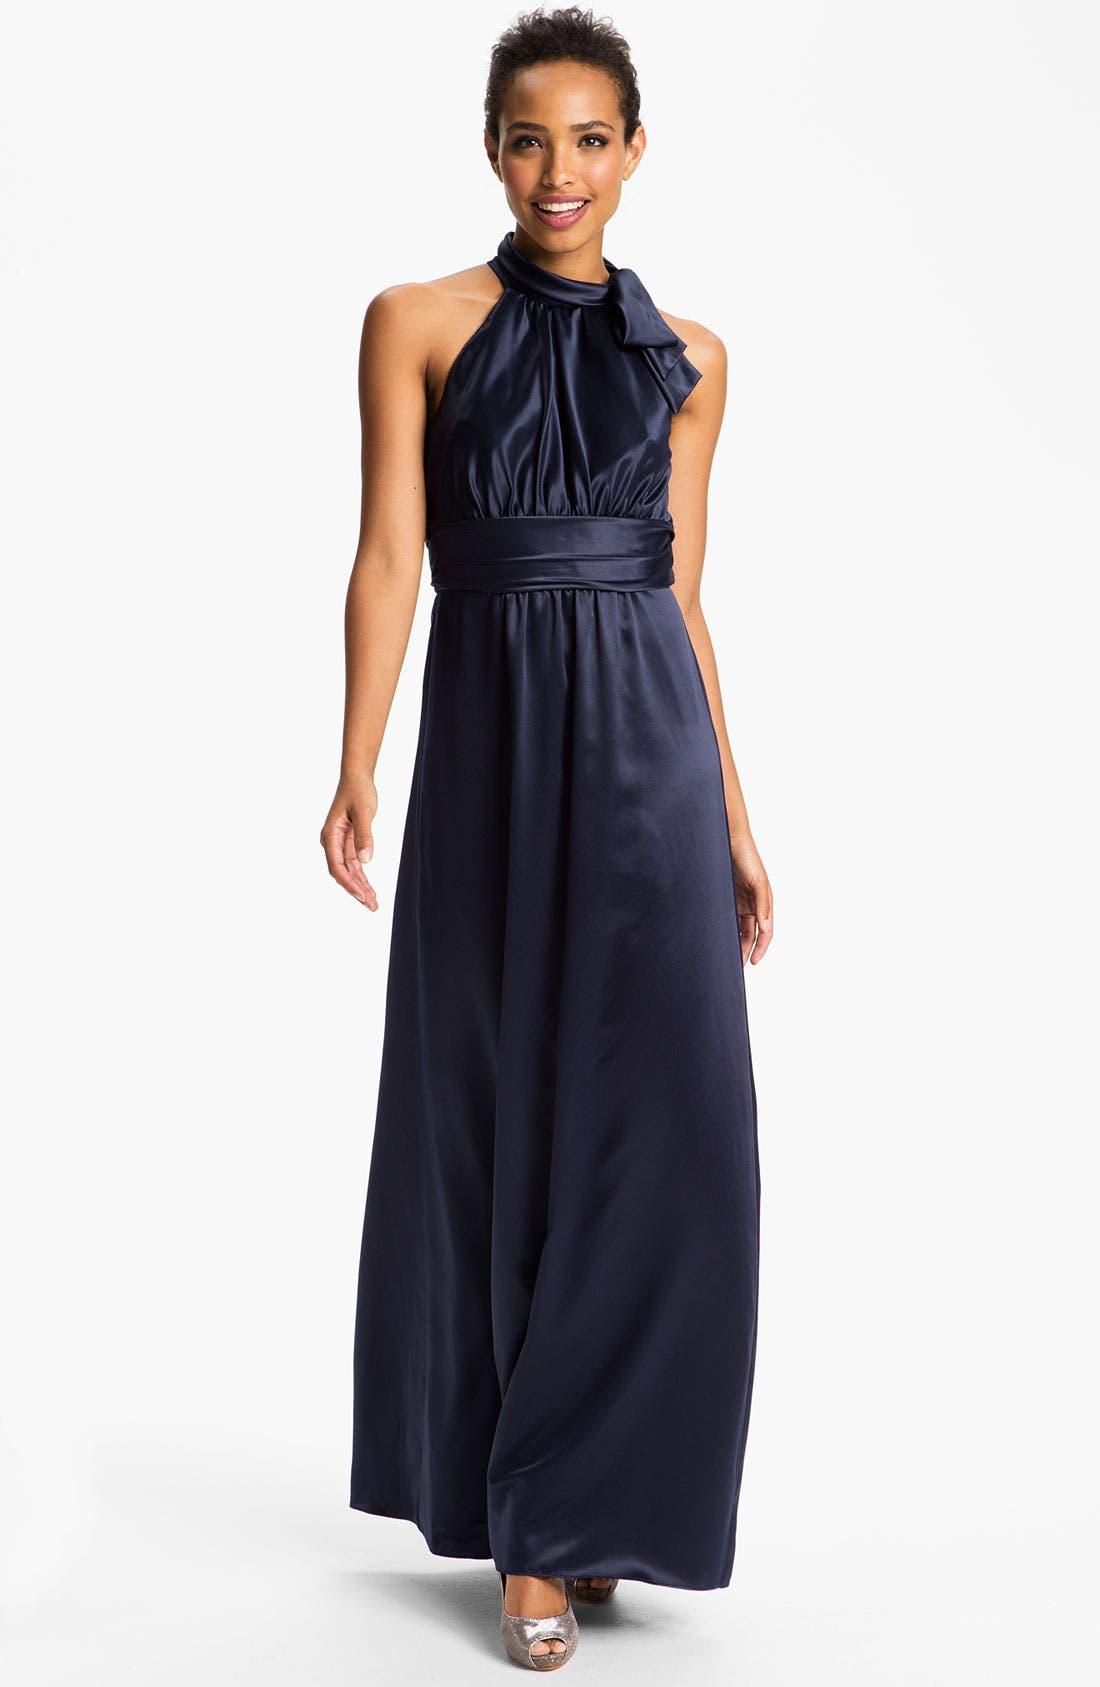 Main Image - Amsale Tie Neck Satin A-Line Gown